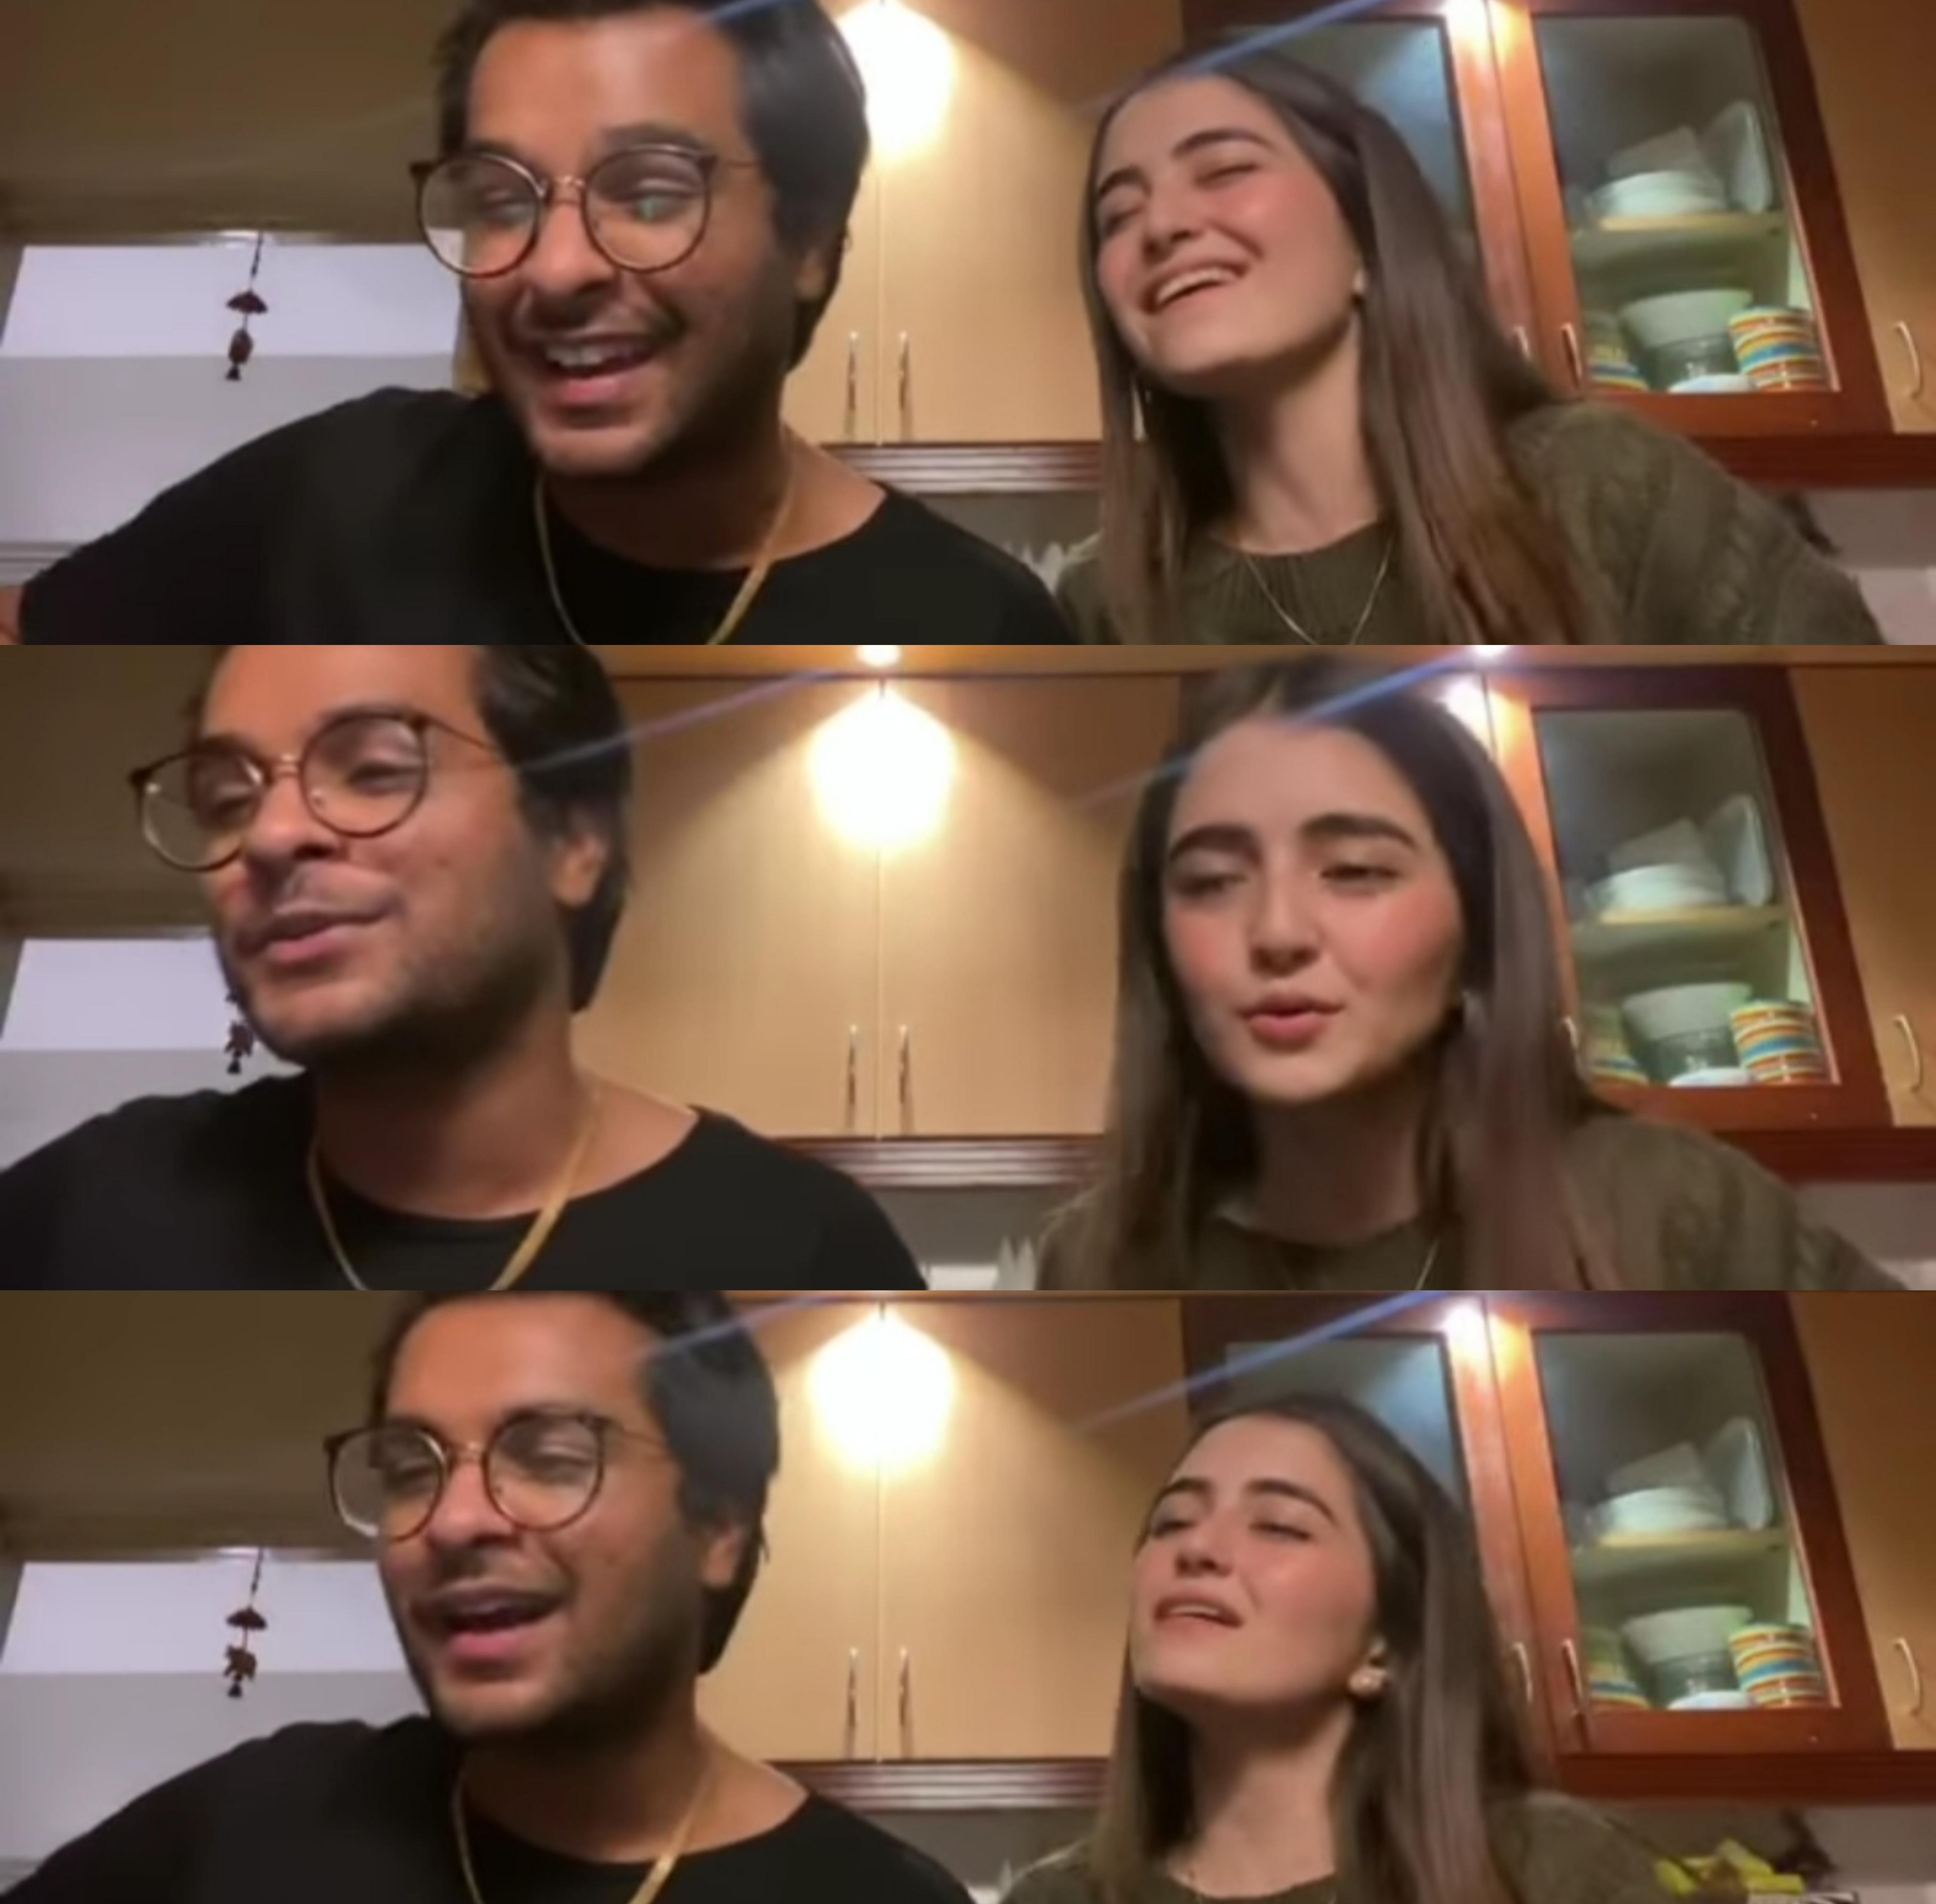 Asim Azhar jamming with Merub Ali before engagement